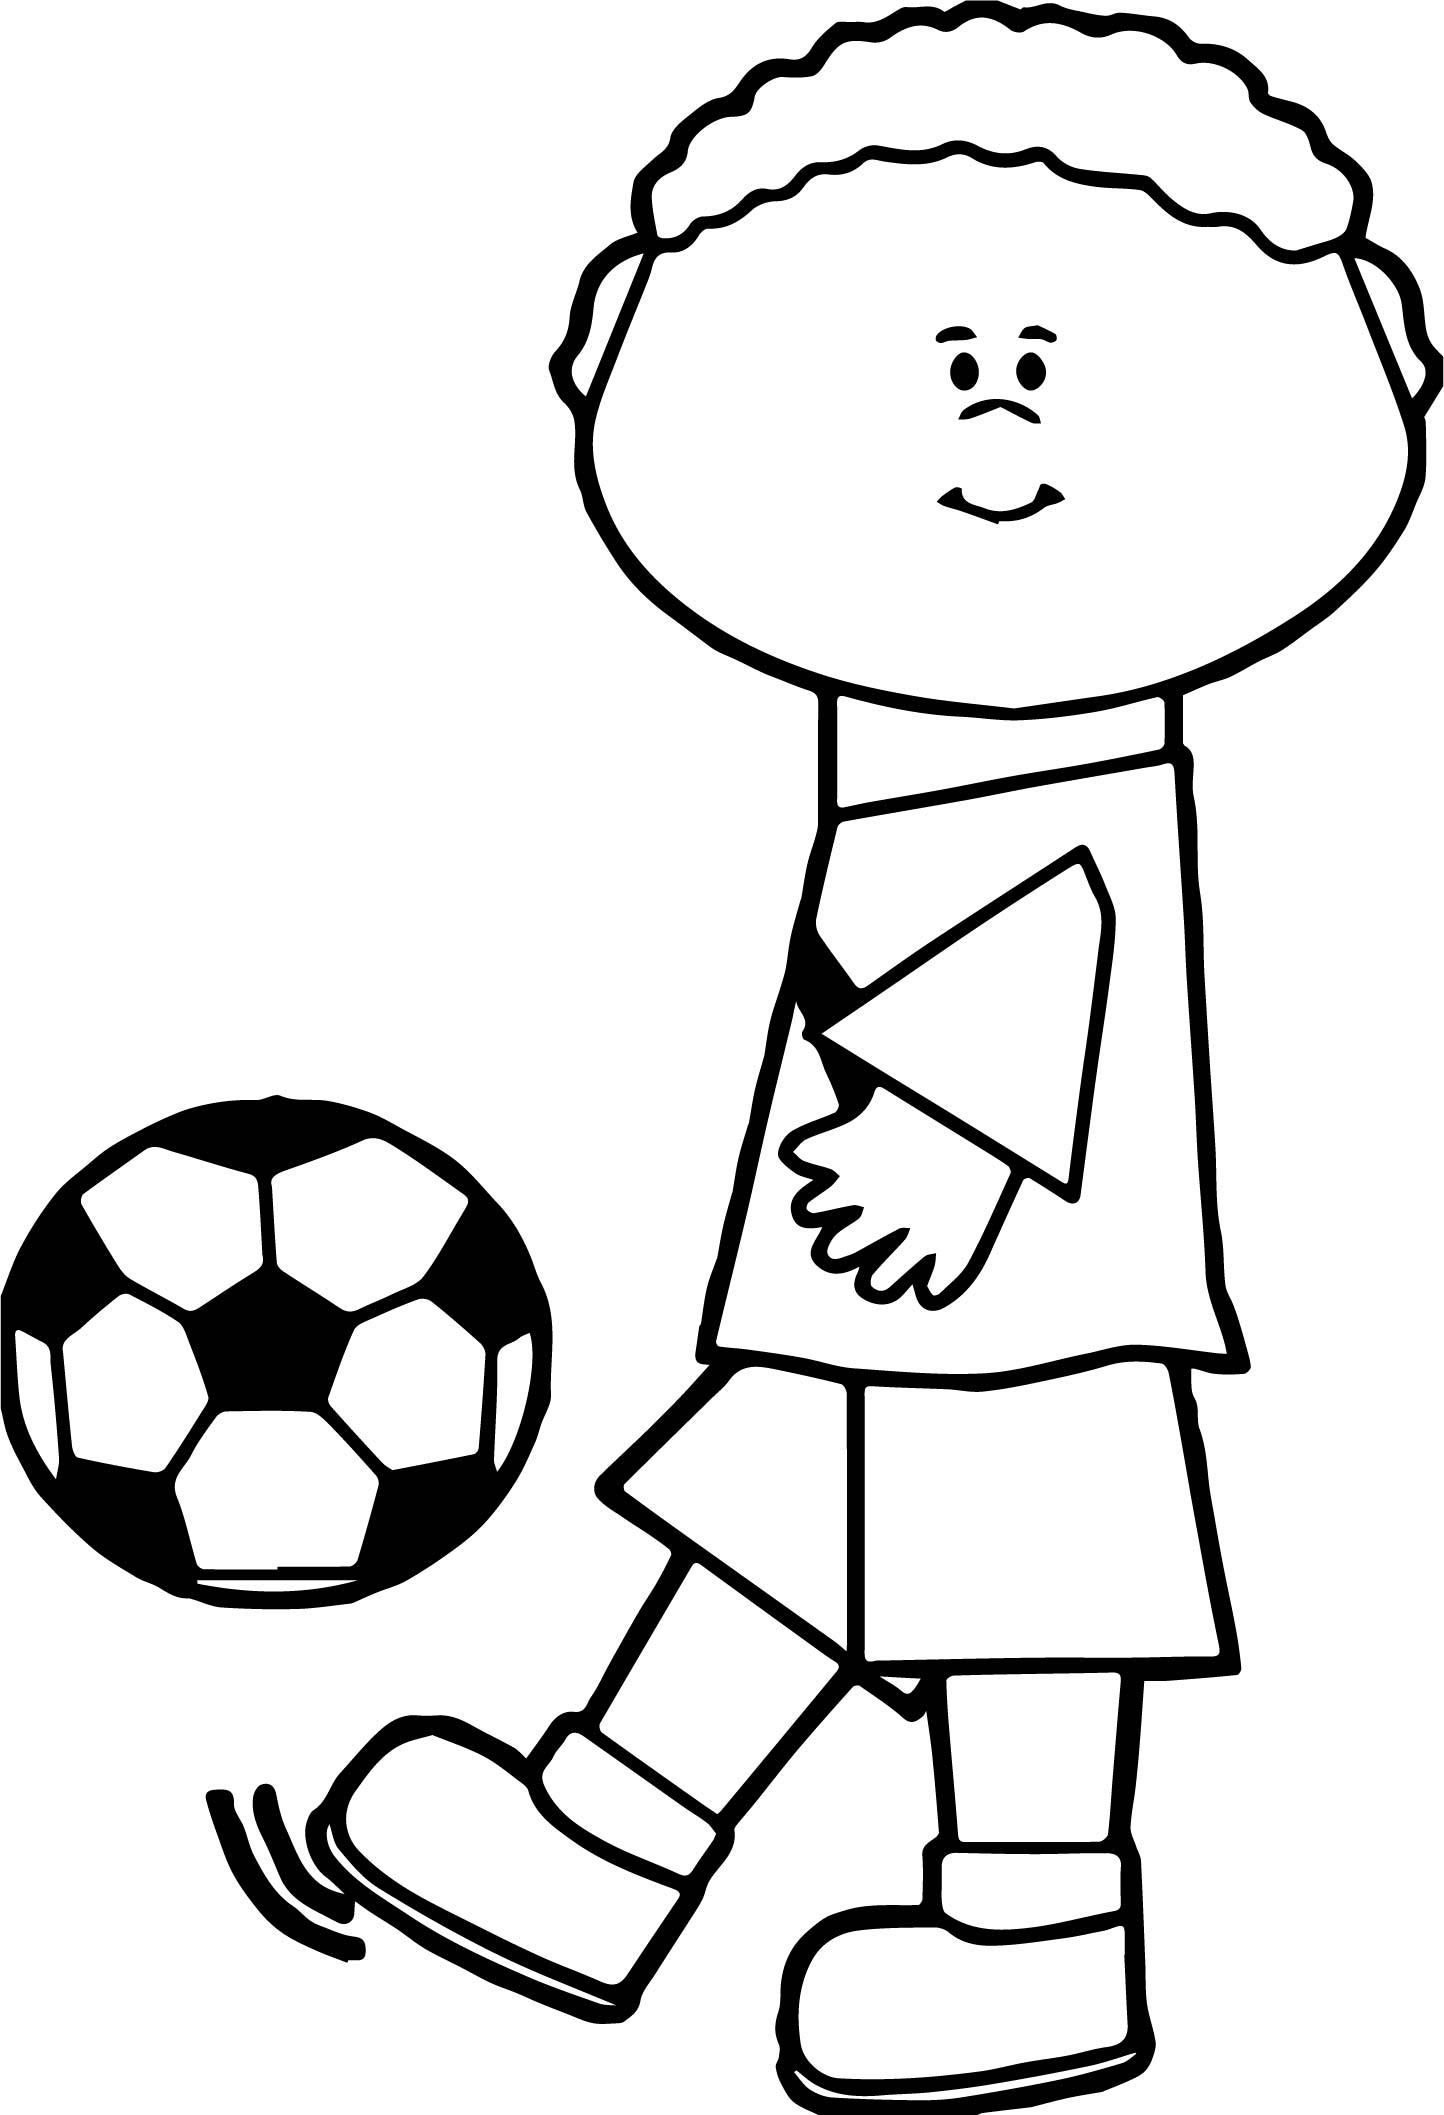 Kids Kick Soccer Ball Playing Football Coloring Page